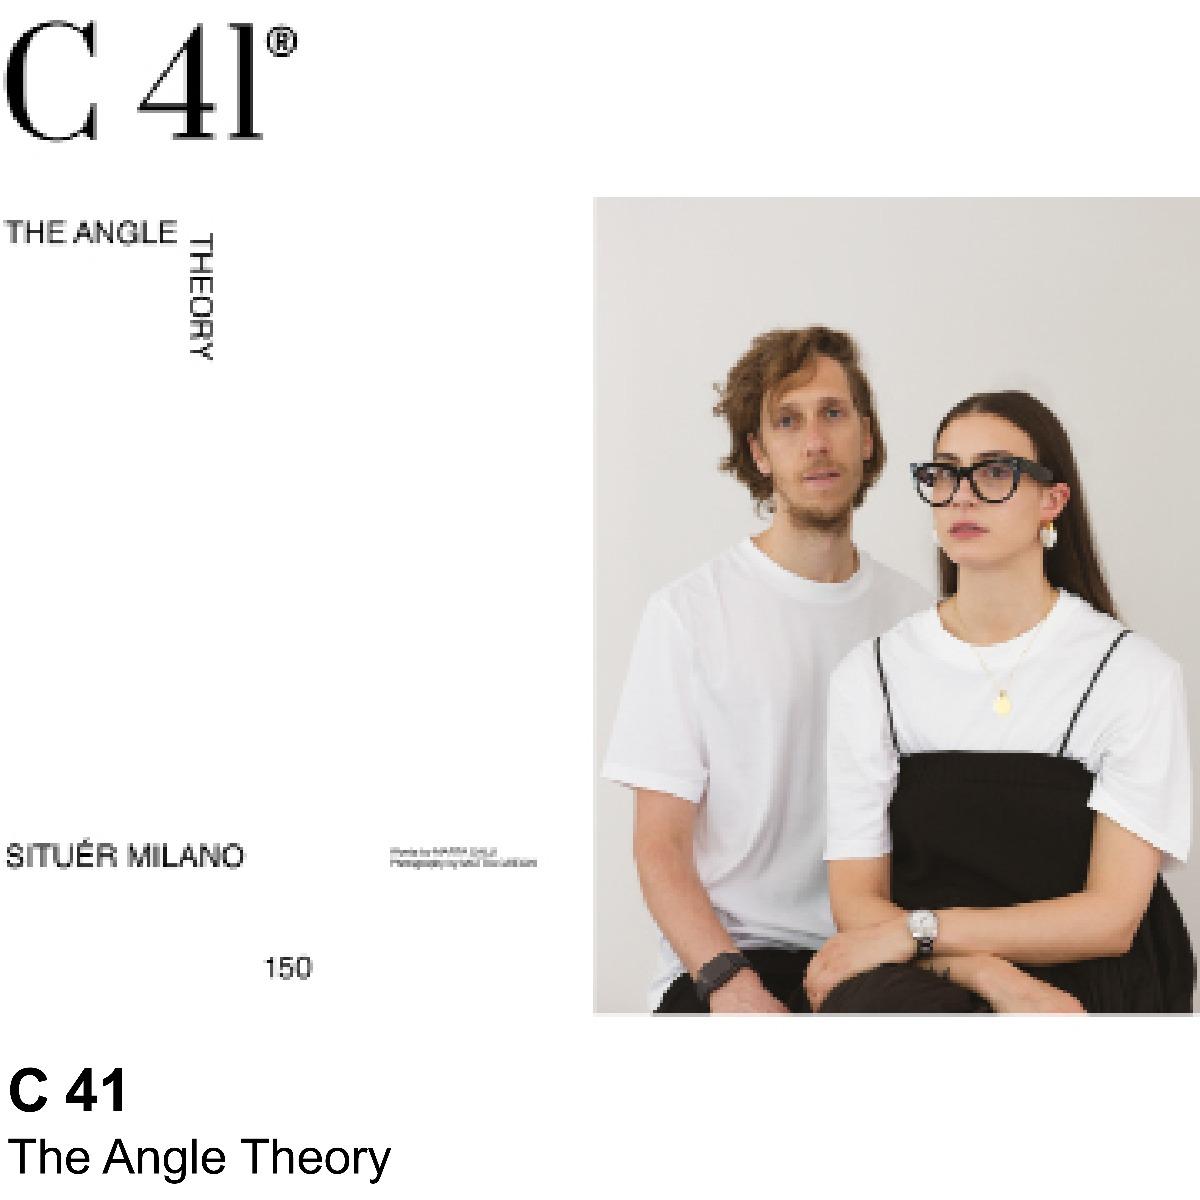 situèr milano intervista per c41 magazine